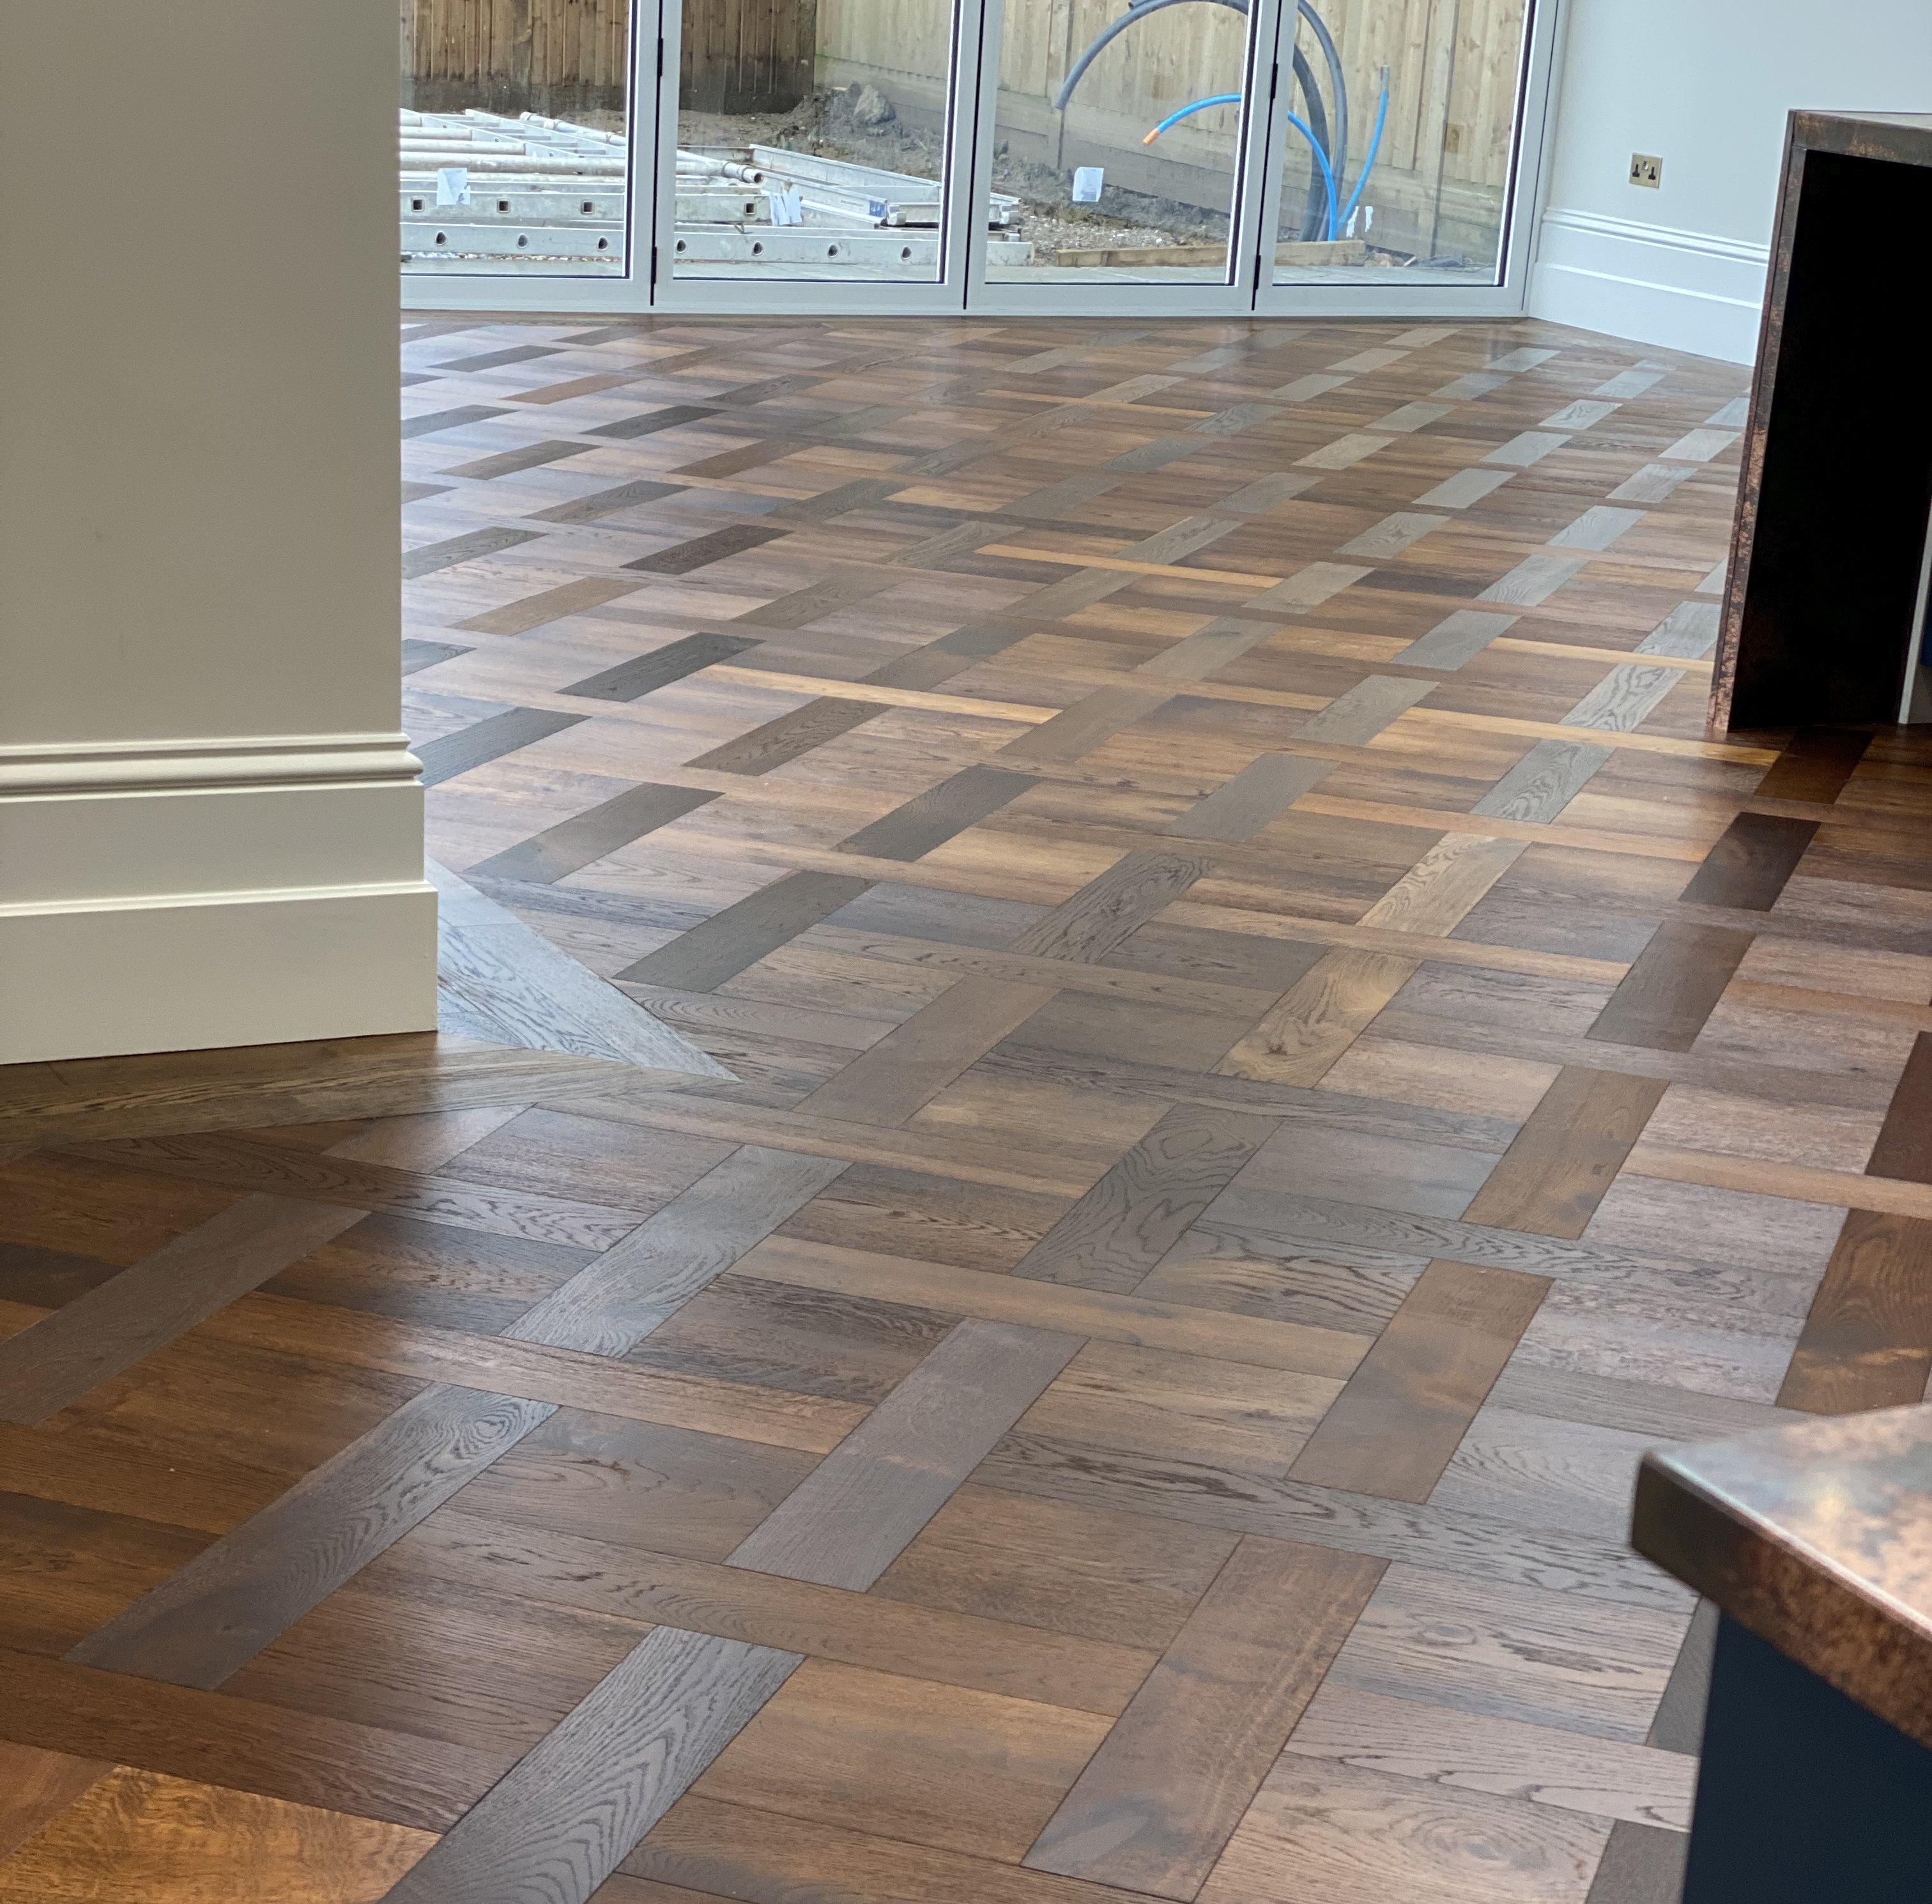 Herringbone Basket weave pattern parquet wood flooring in a hallway TW E931